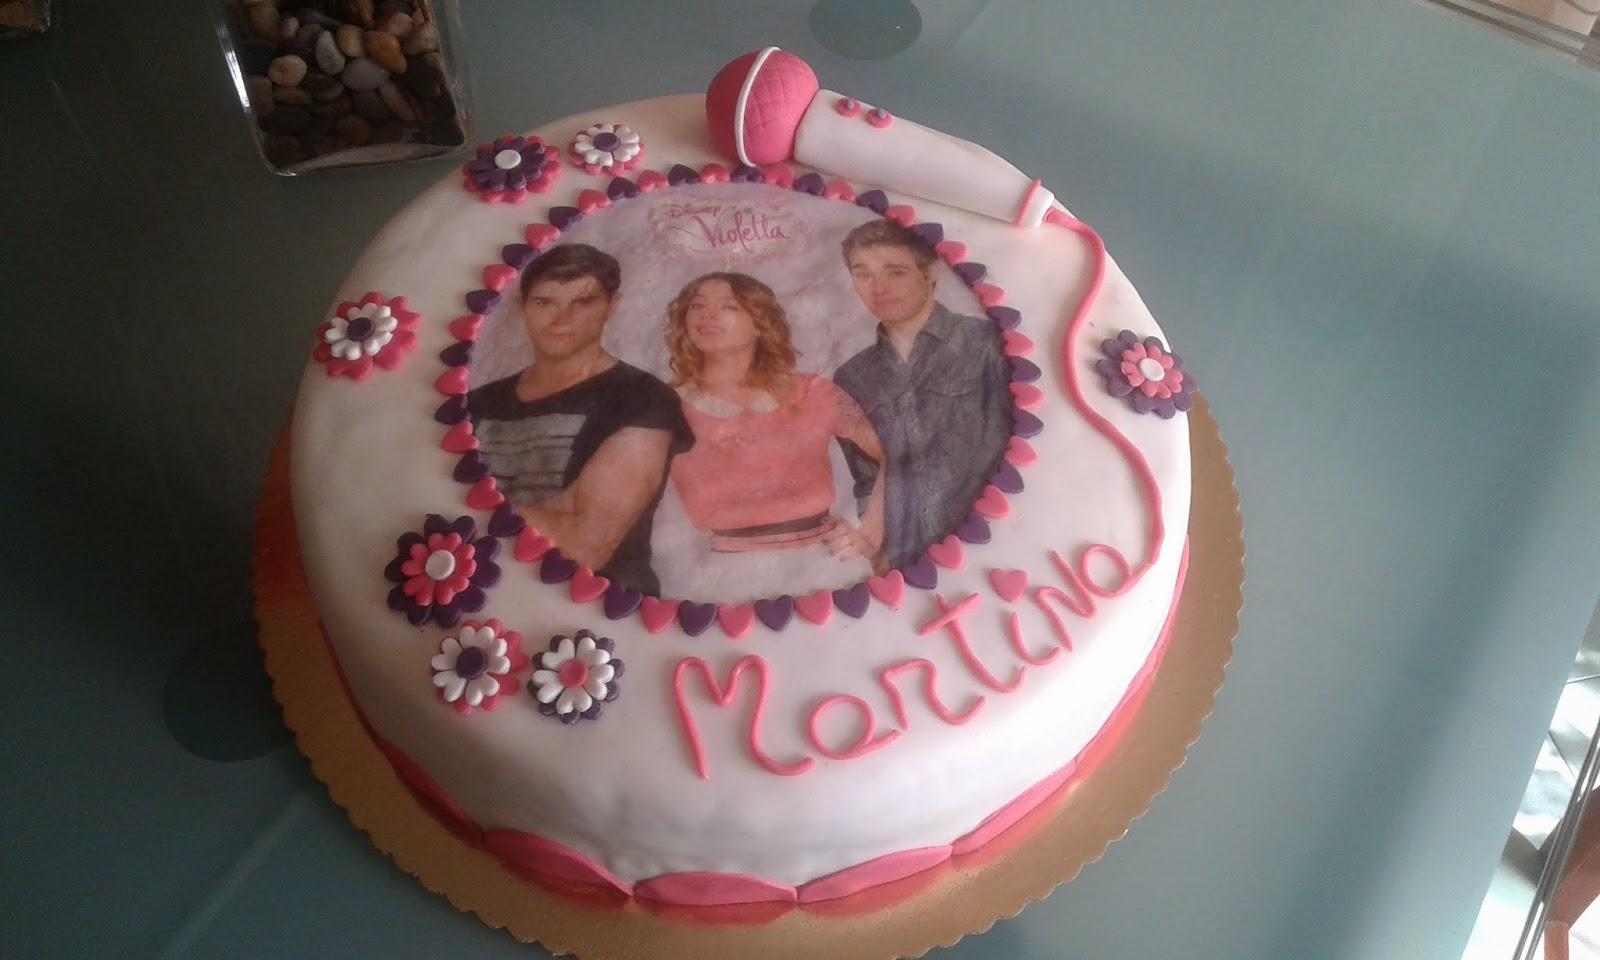 Torta Cake Design Violetta : Art Sugar Crystals: Torta Violetta pdz